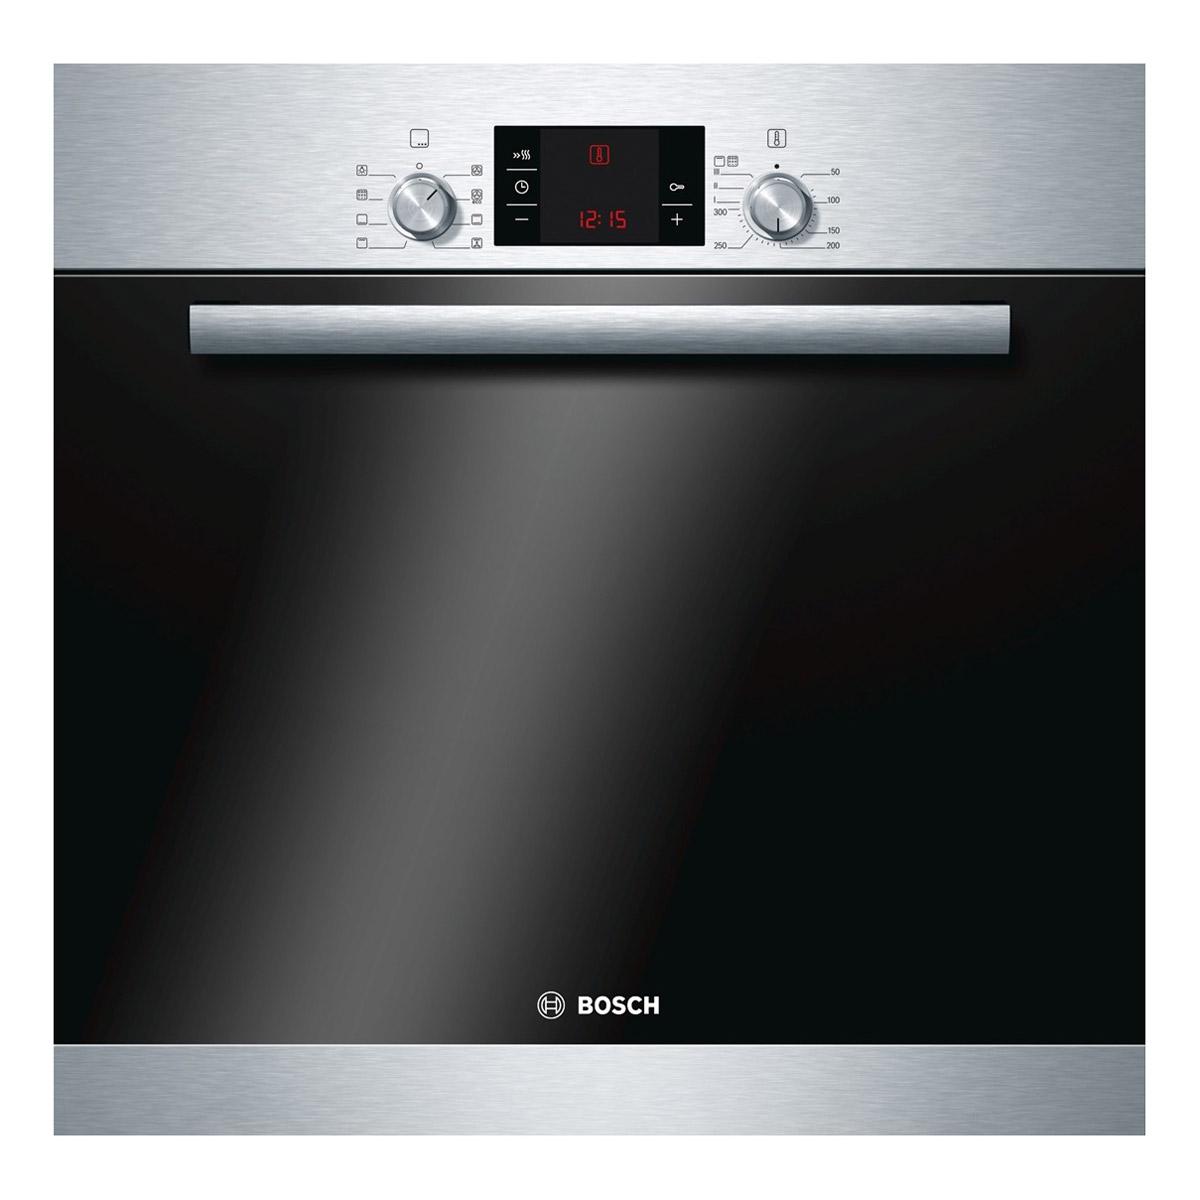 bosch hba63b150b serie 6 single pyrolytic multifunction oven in br steel rh sonicdirect co uk bosch 60cm pyrolytic oven manual bosch pyrolytic oven instruction manual